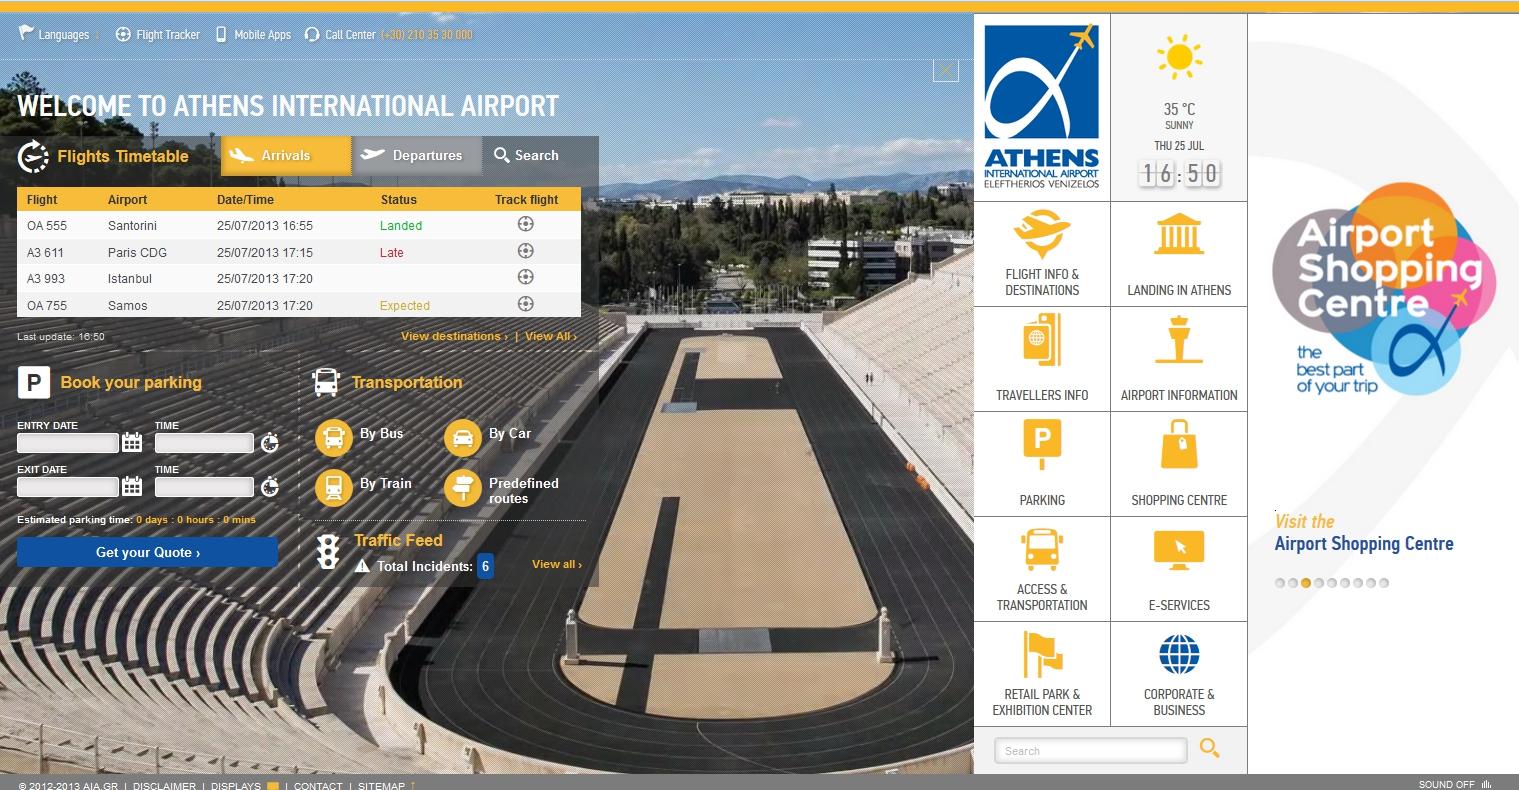 Athens International Airport website screencap